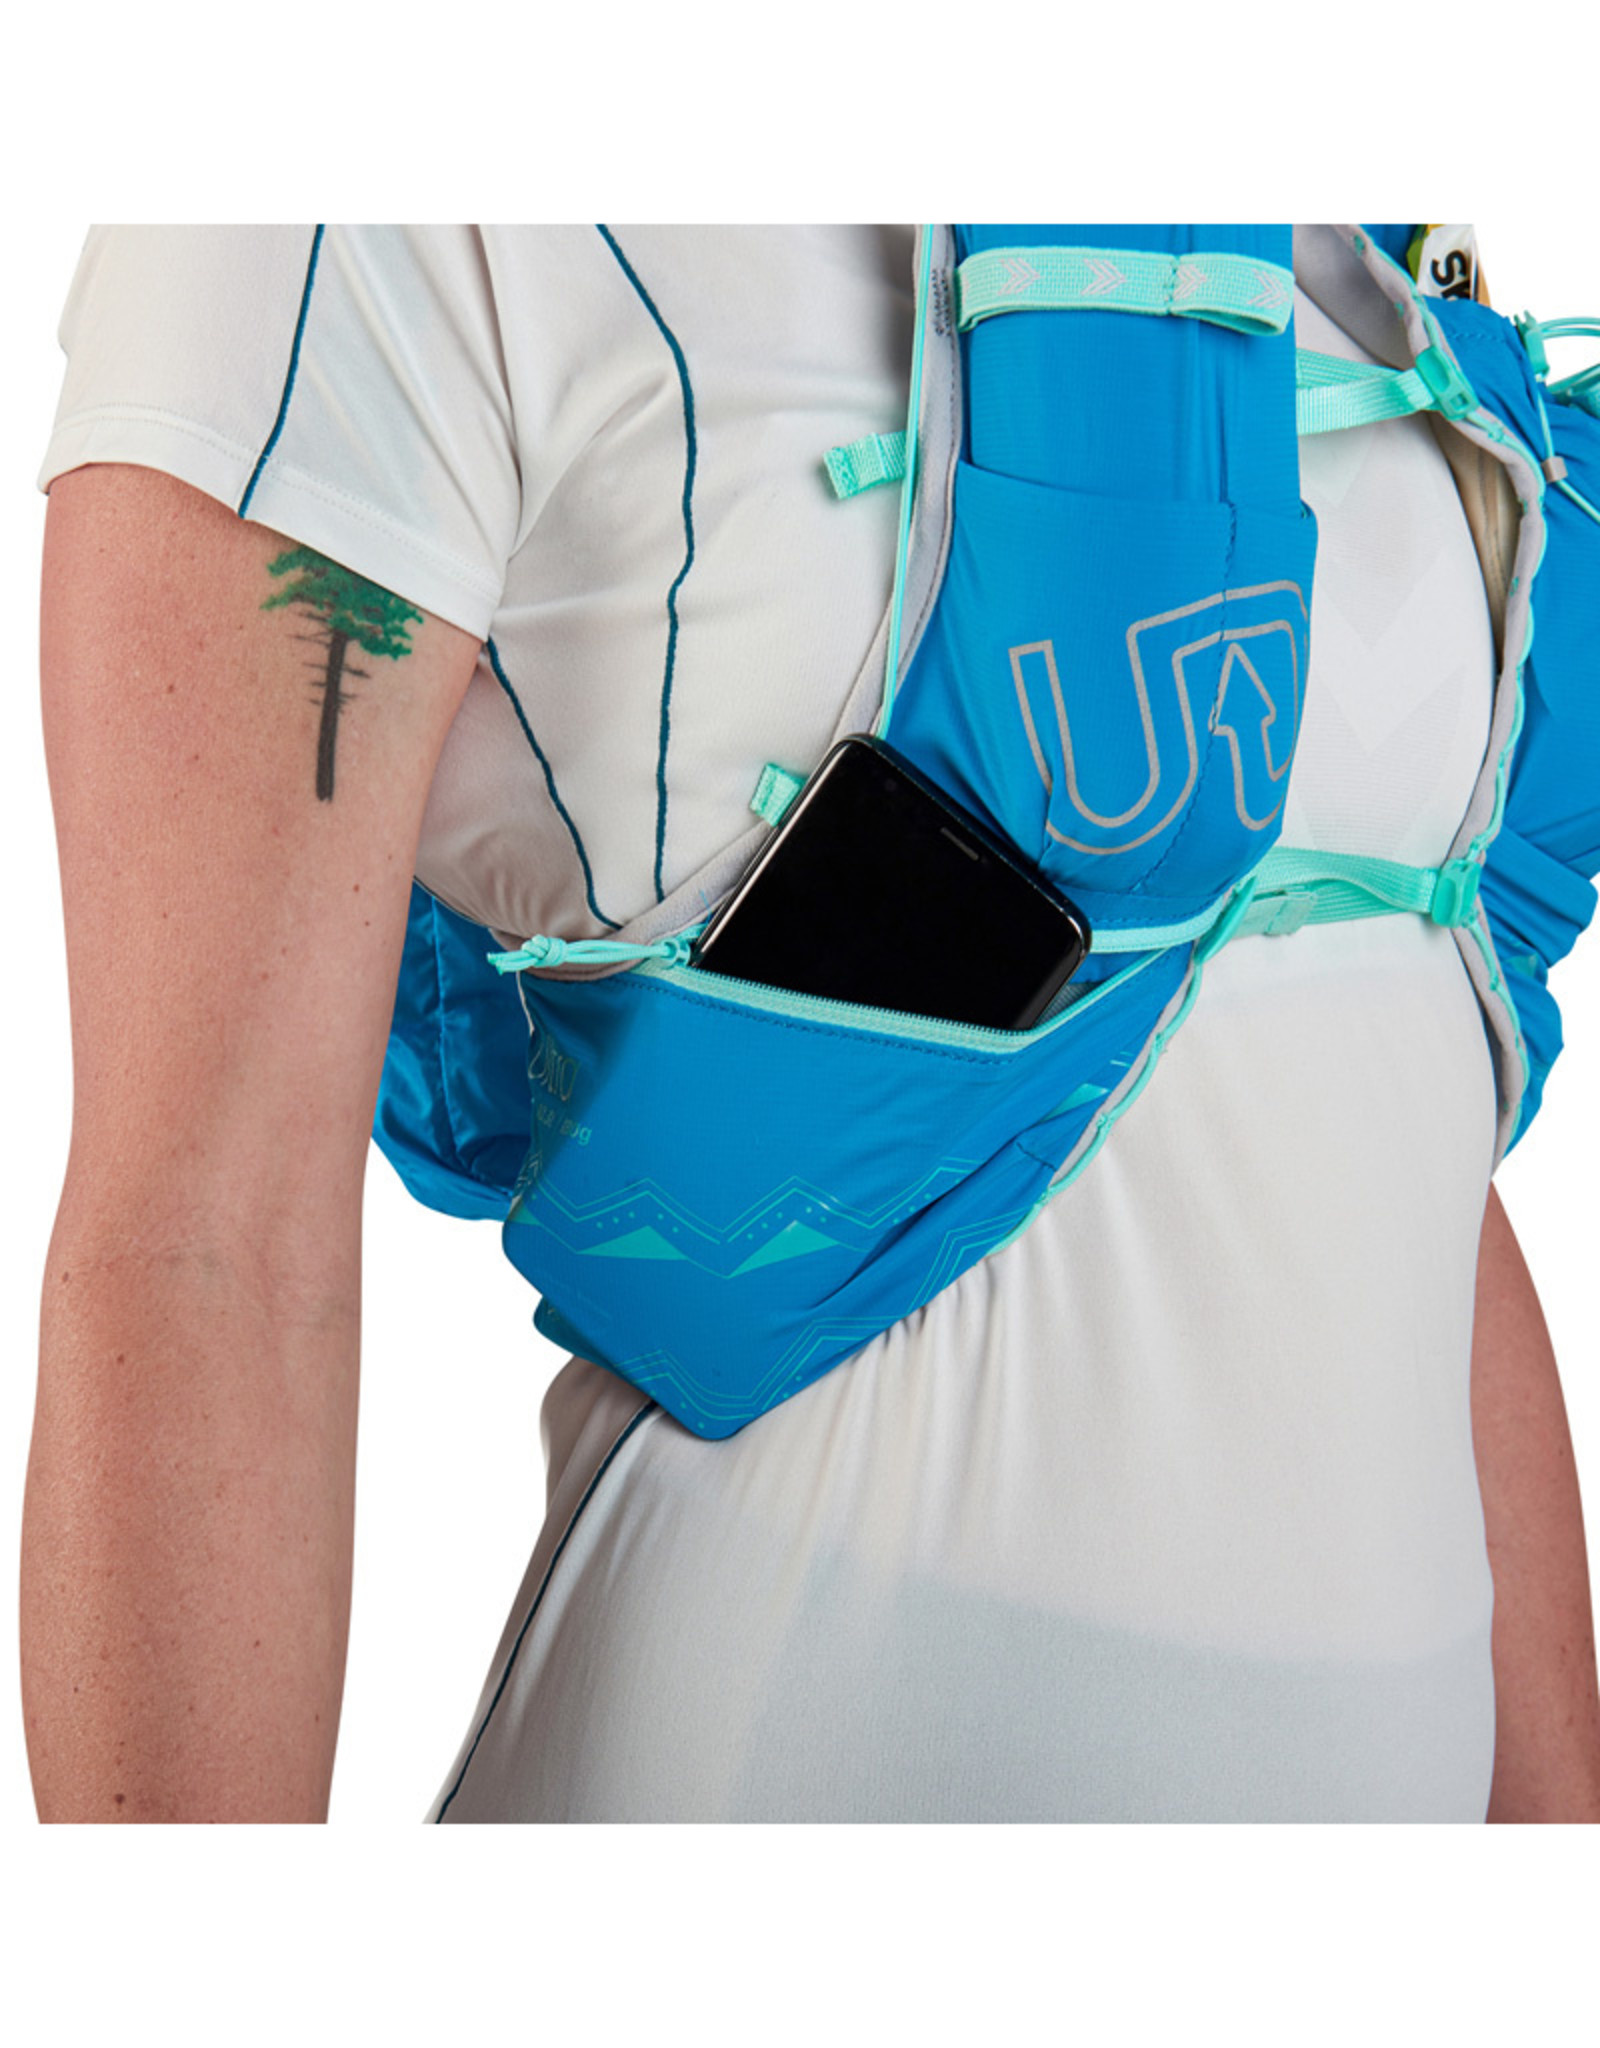 Ultimate Direction Ultra Vesta 5.0 Trail Rugzak - Blauw